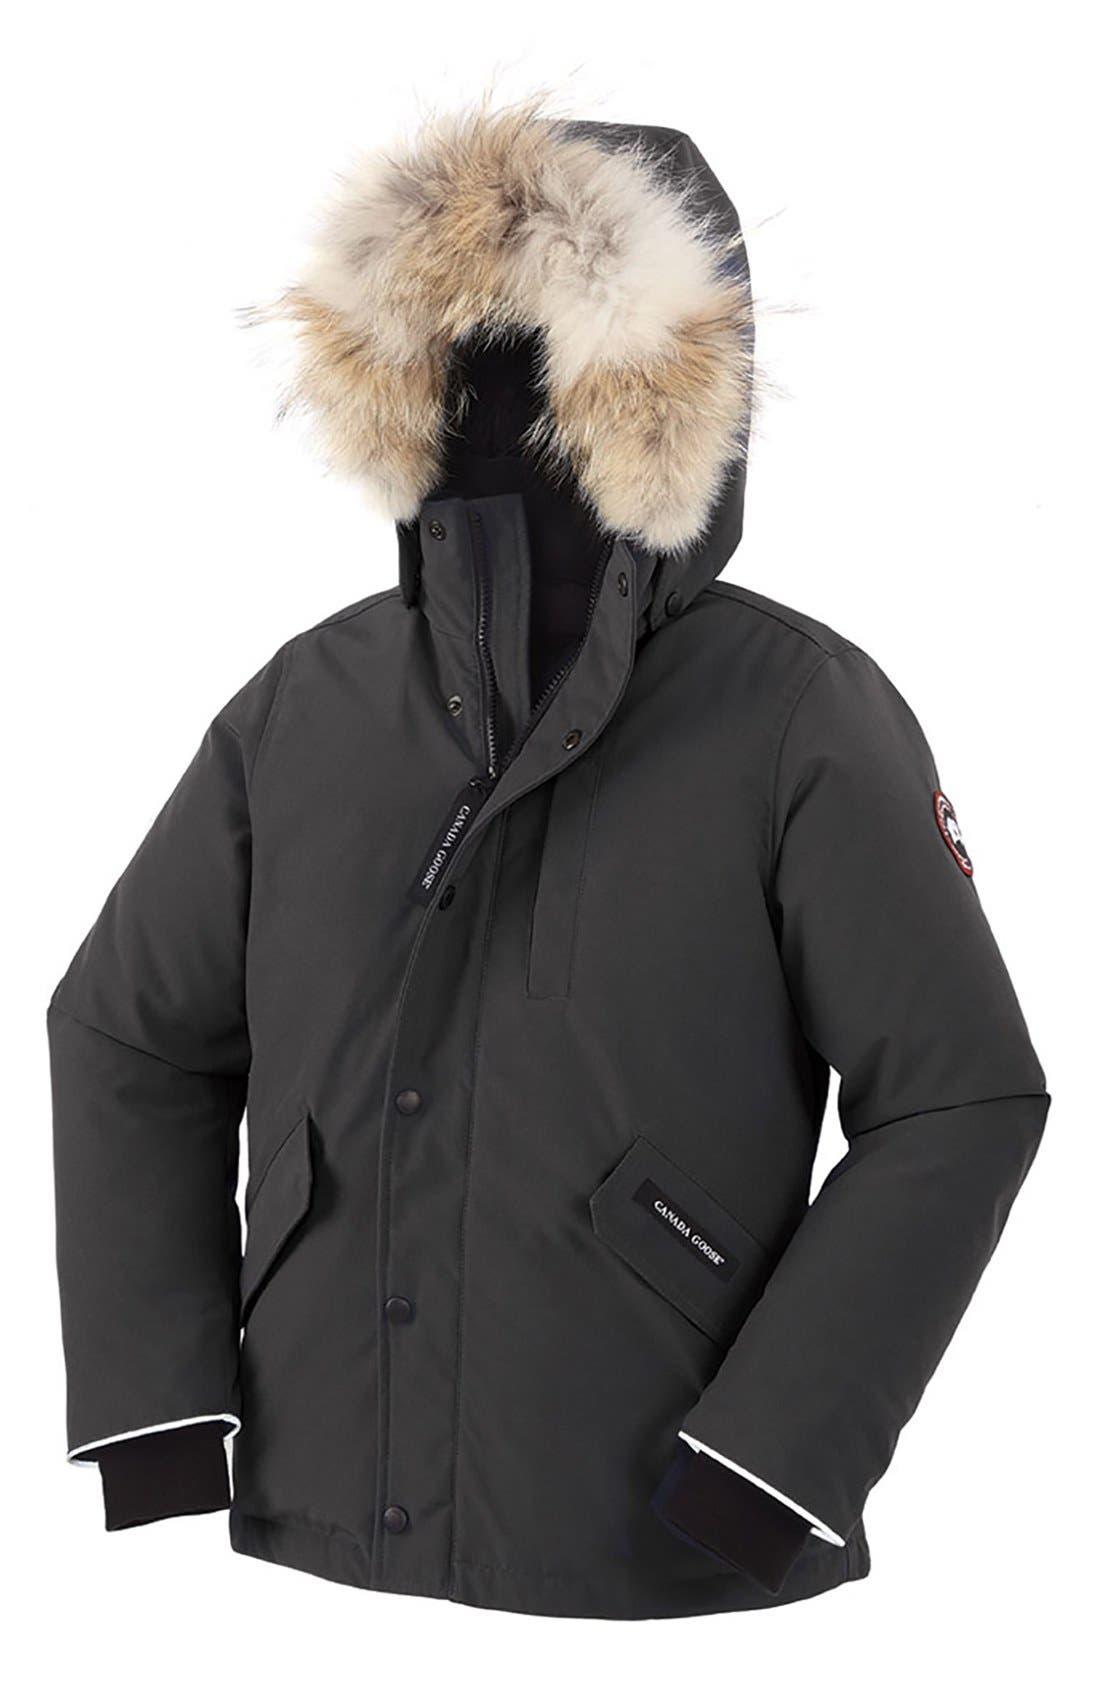 canada goose jacket nordstrom rack